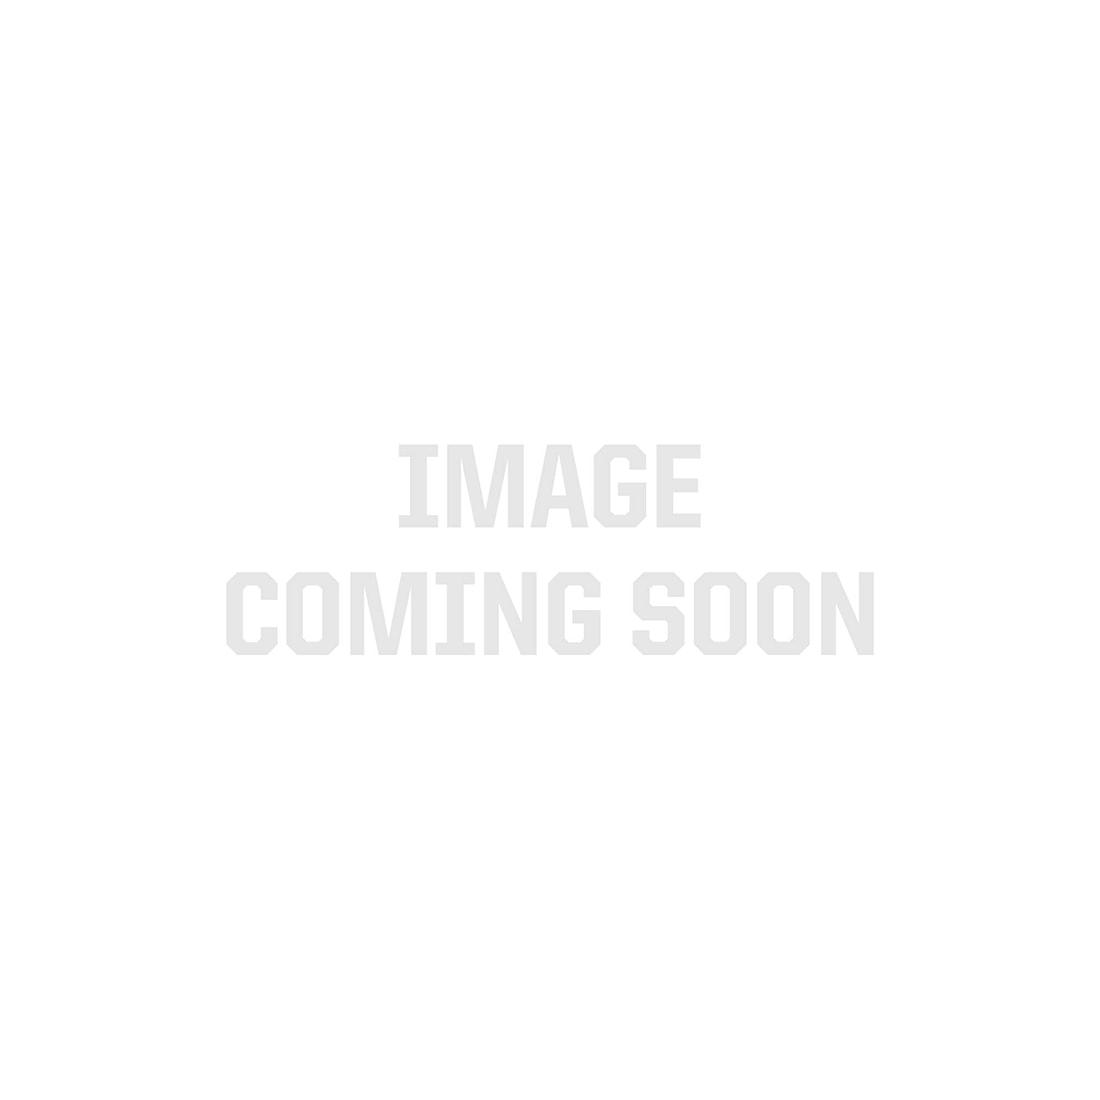 HyperFlex 2835 LED Strip Light - Red - 60/m - CurrentControl - 10m Reel